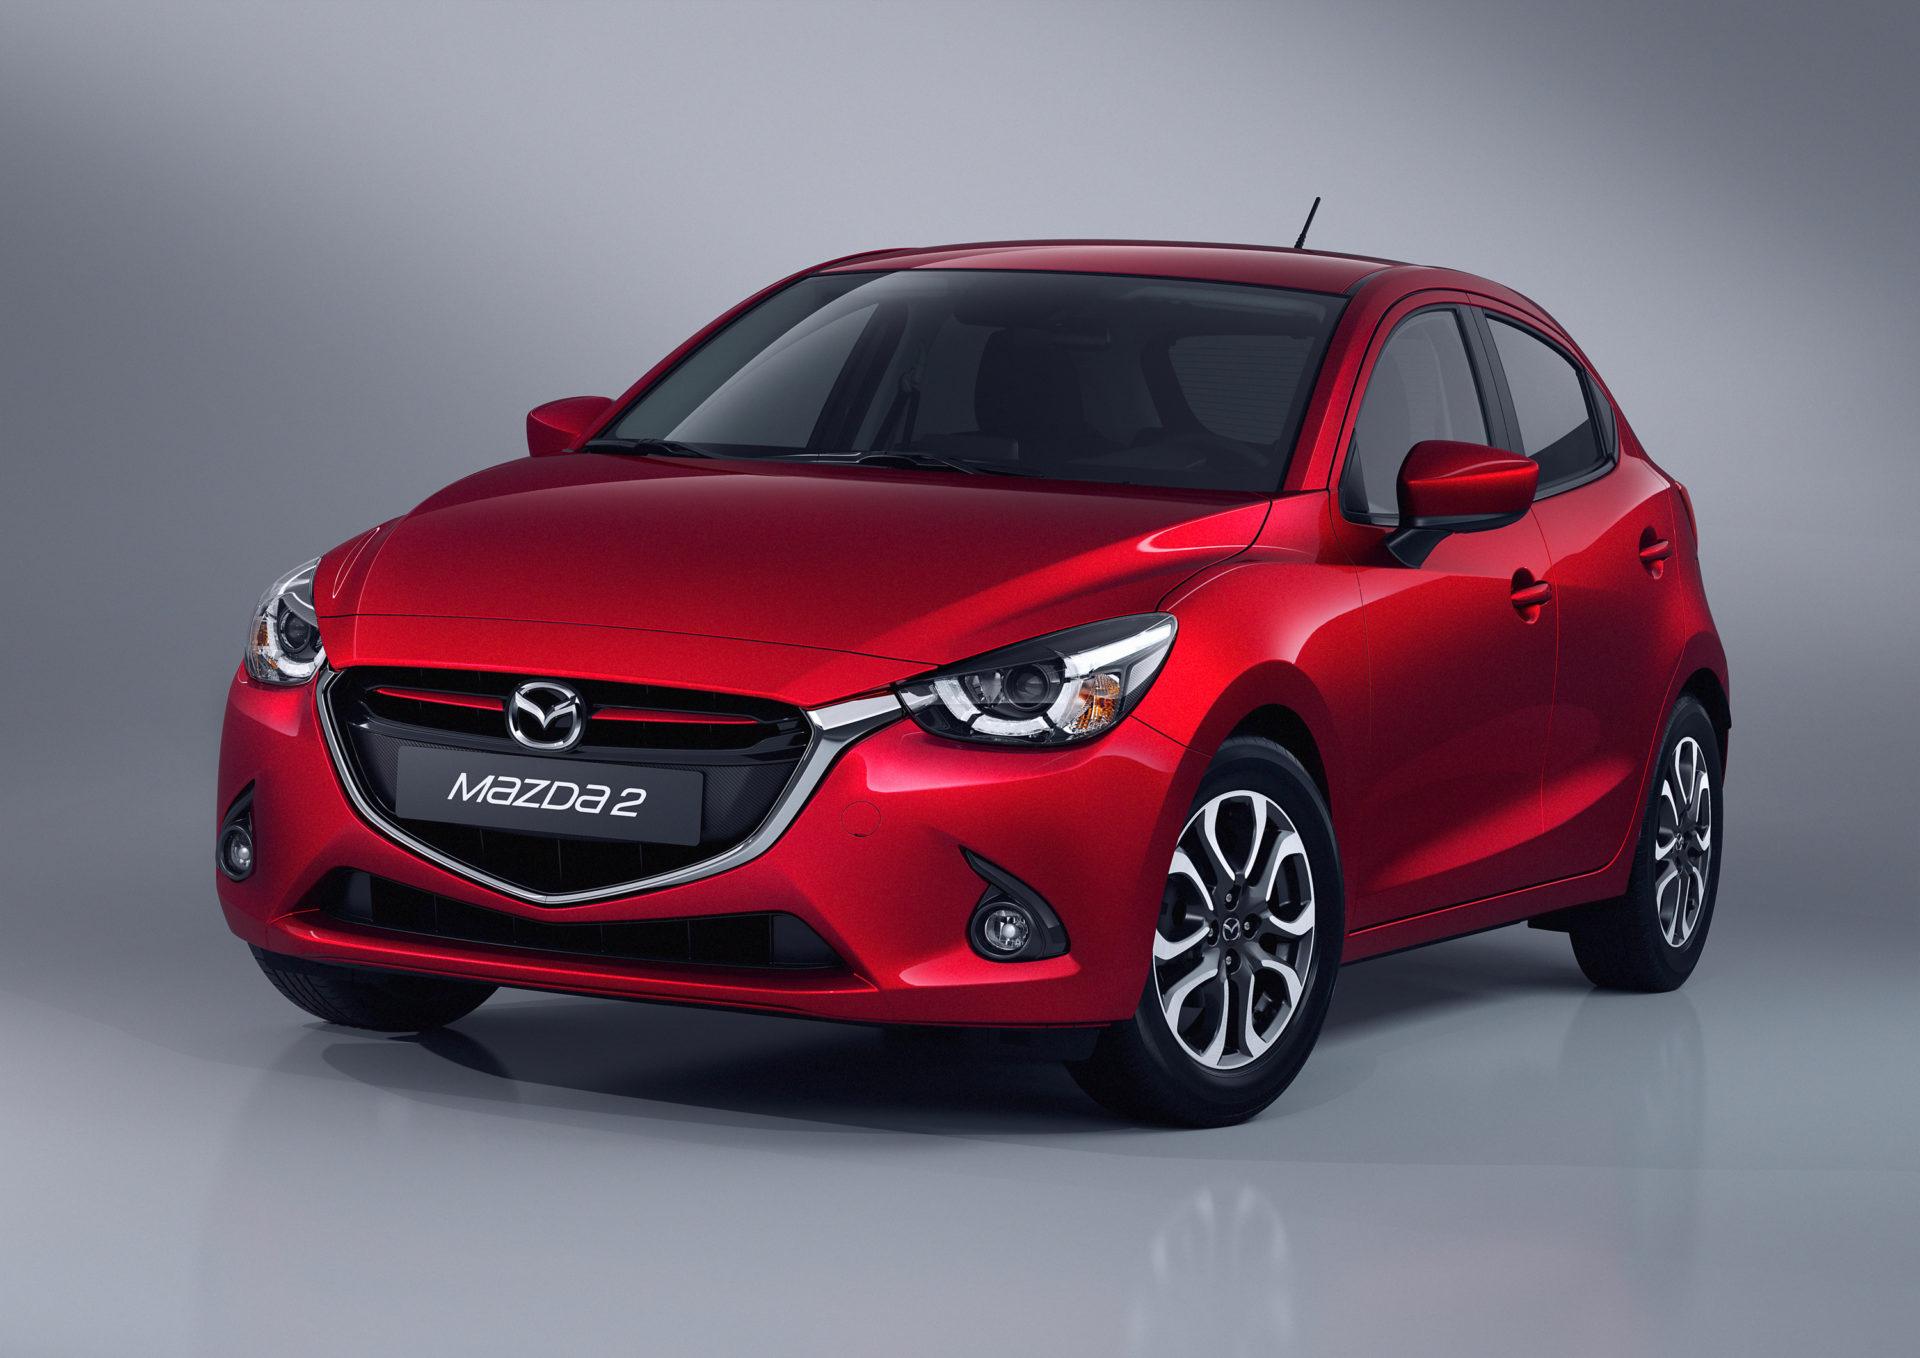 All-new Mazda 2 wins Japan's Car of the Year Award